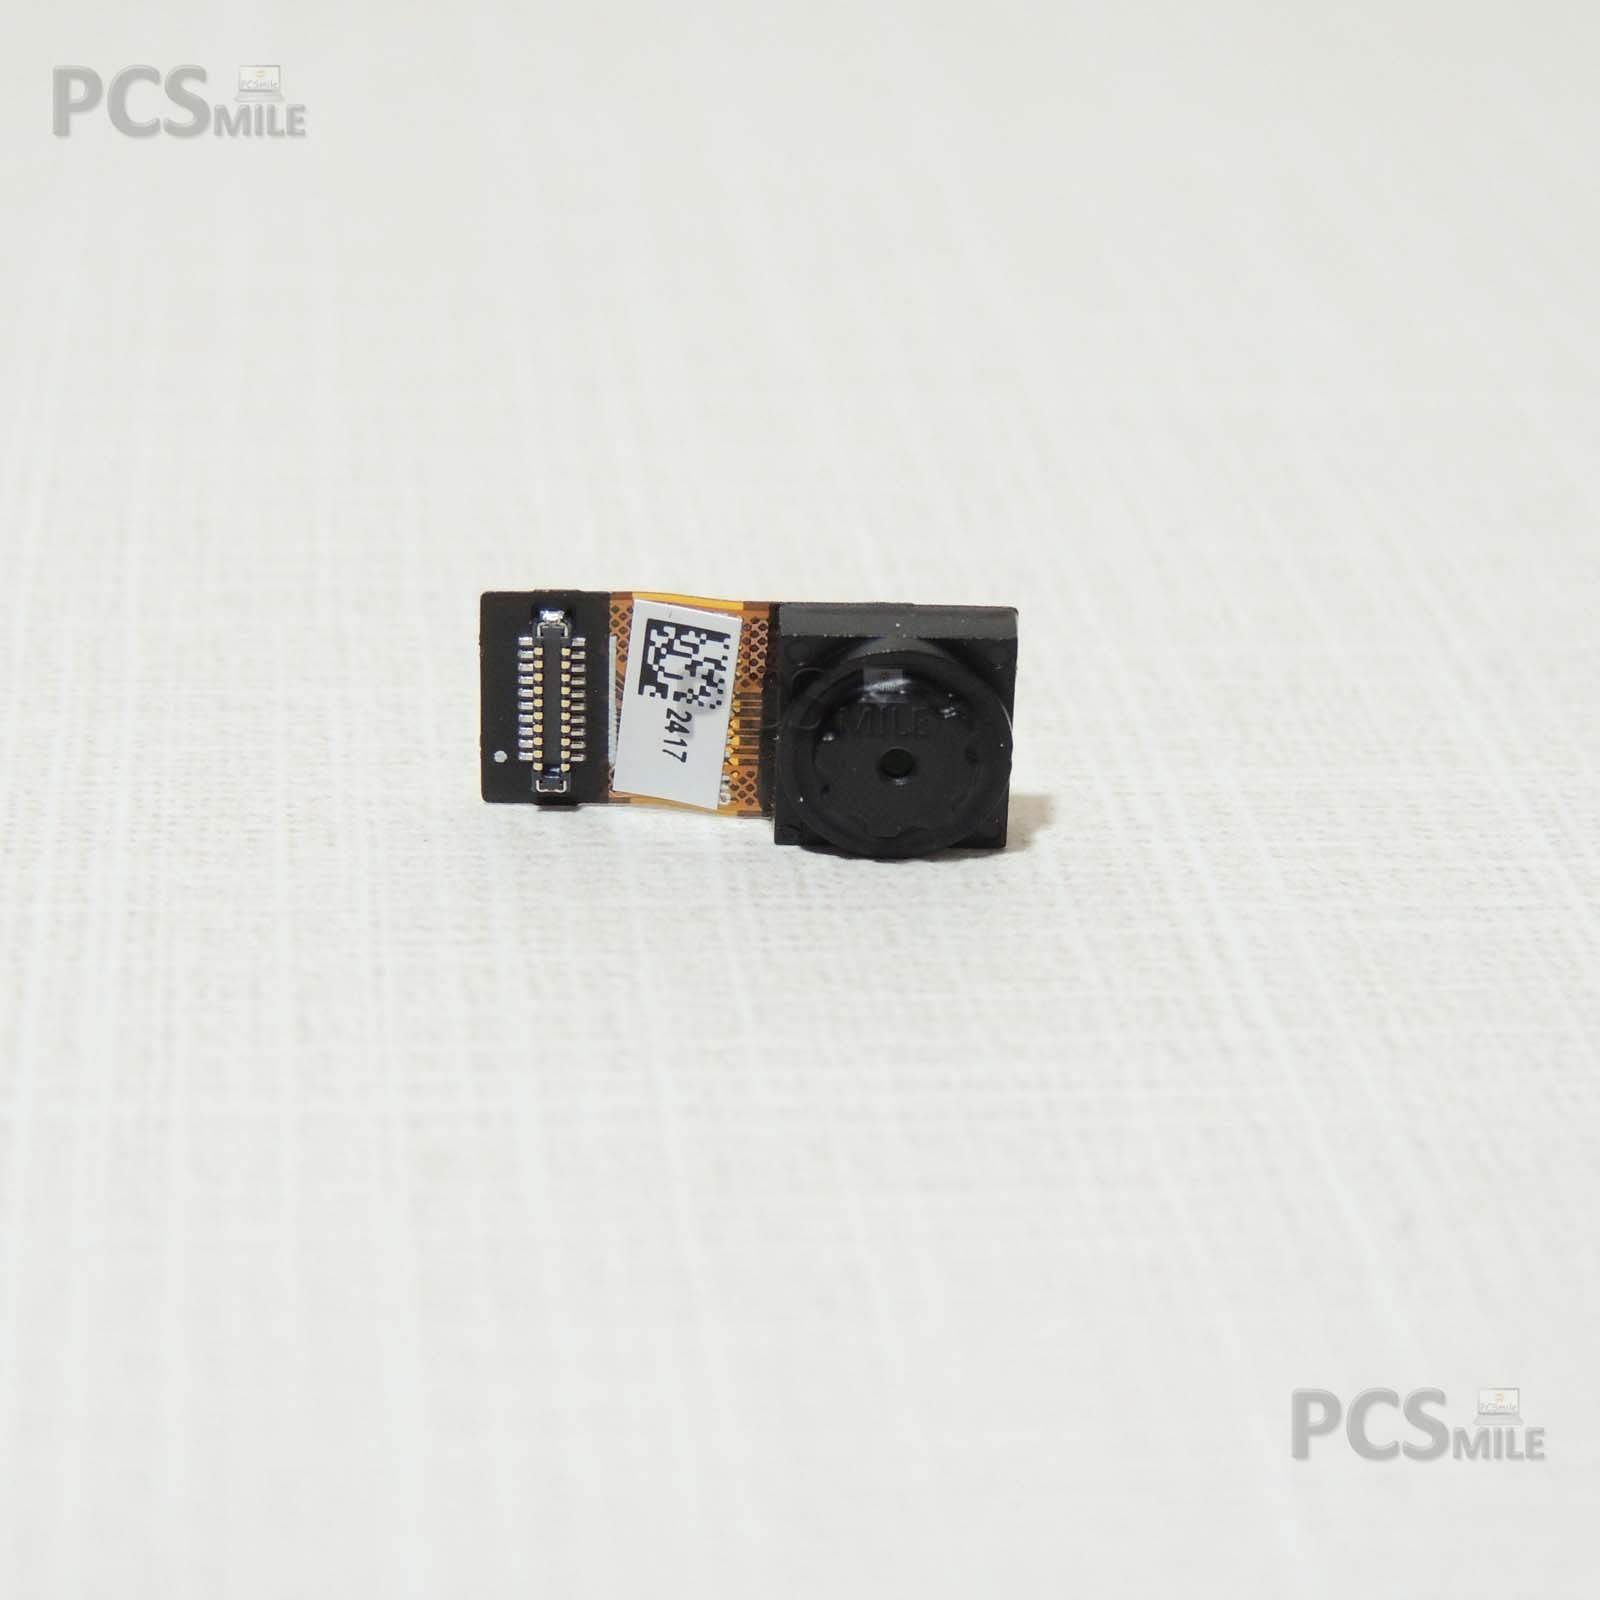 Fotocamera secondaria originale Nokia Lumia 550 RM-1127 Selfie frontale